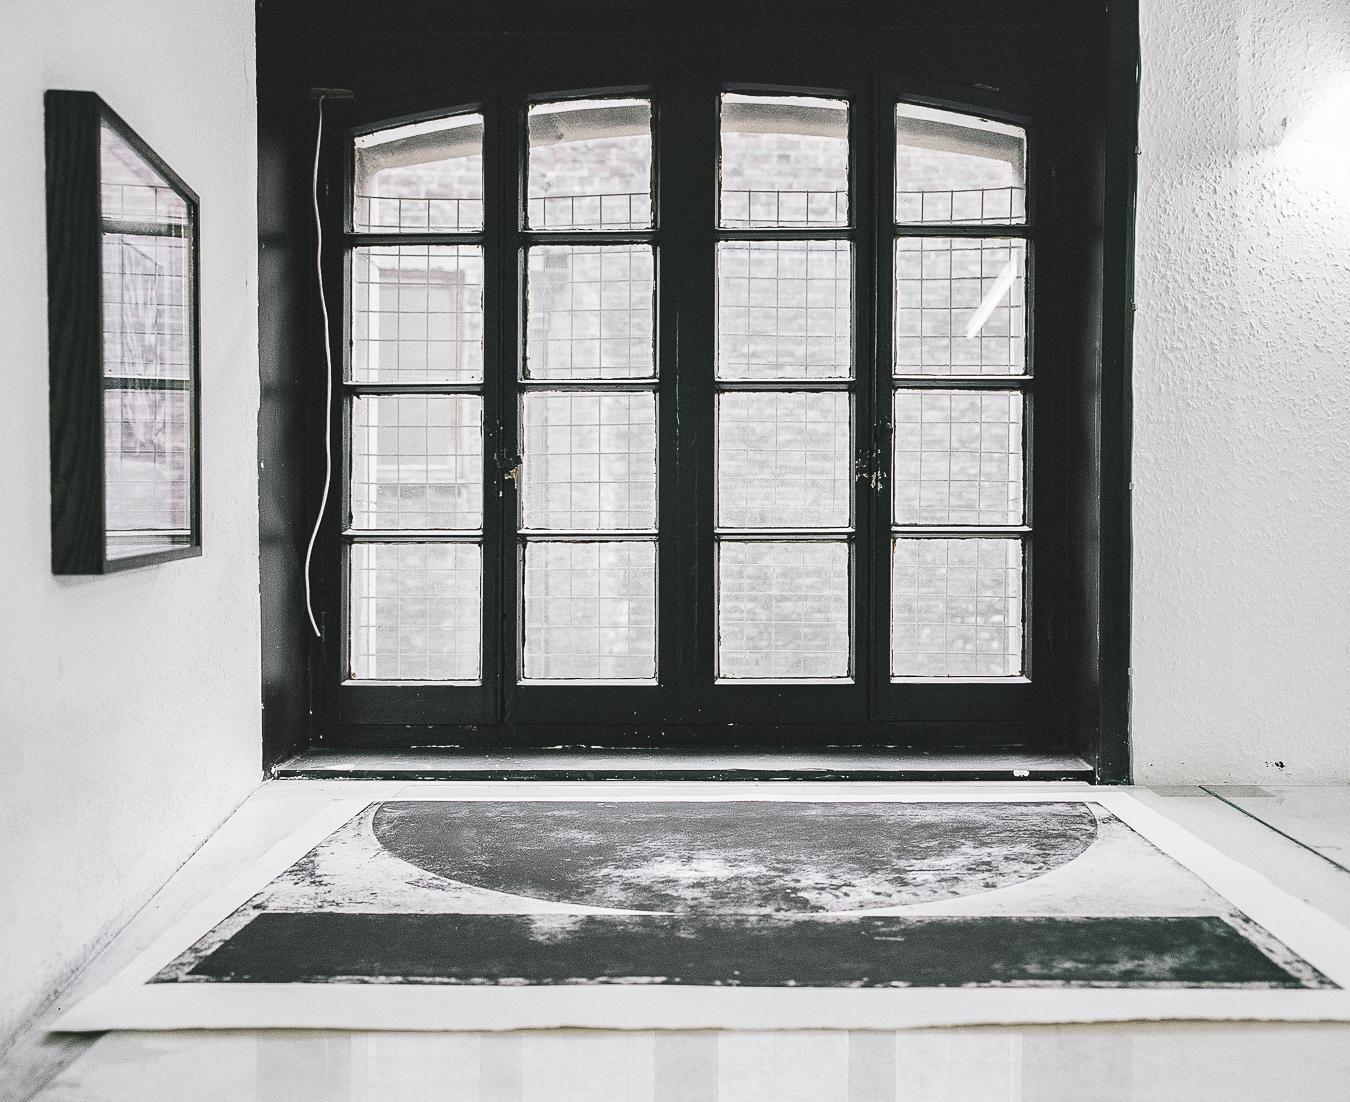 Theodore Ereira-Guyer's Prints Display